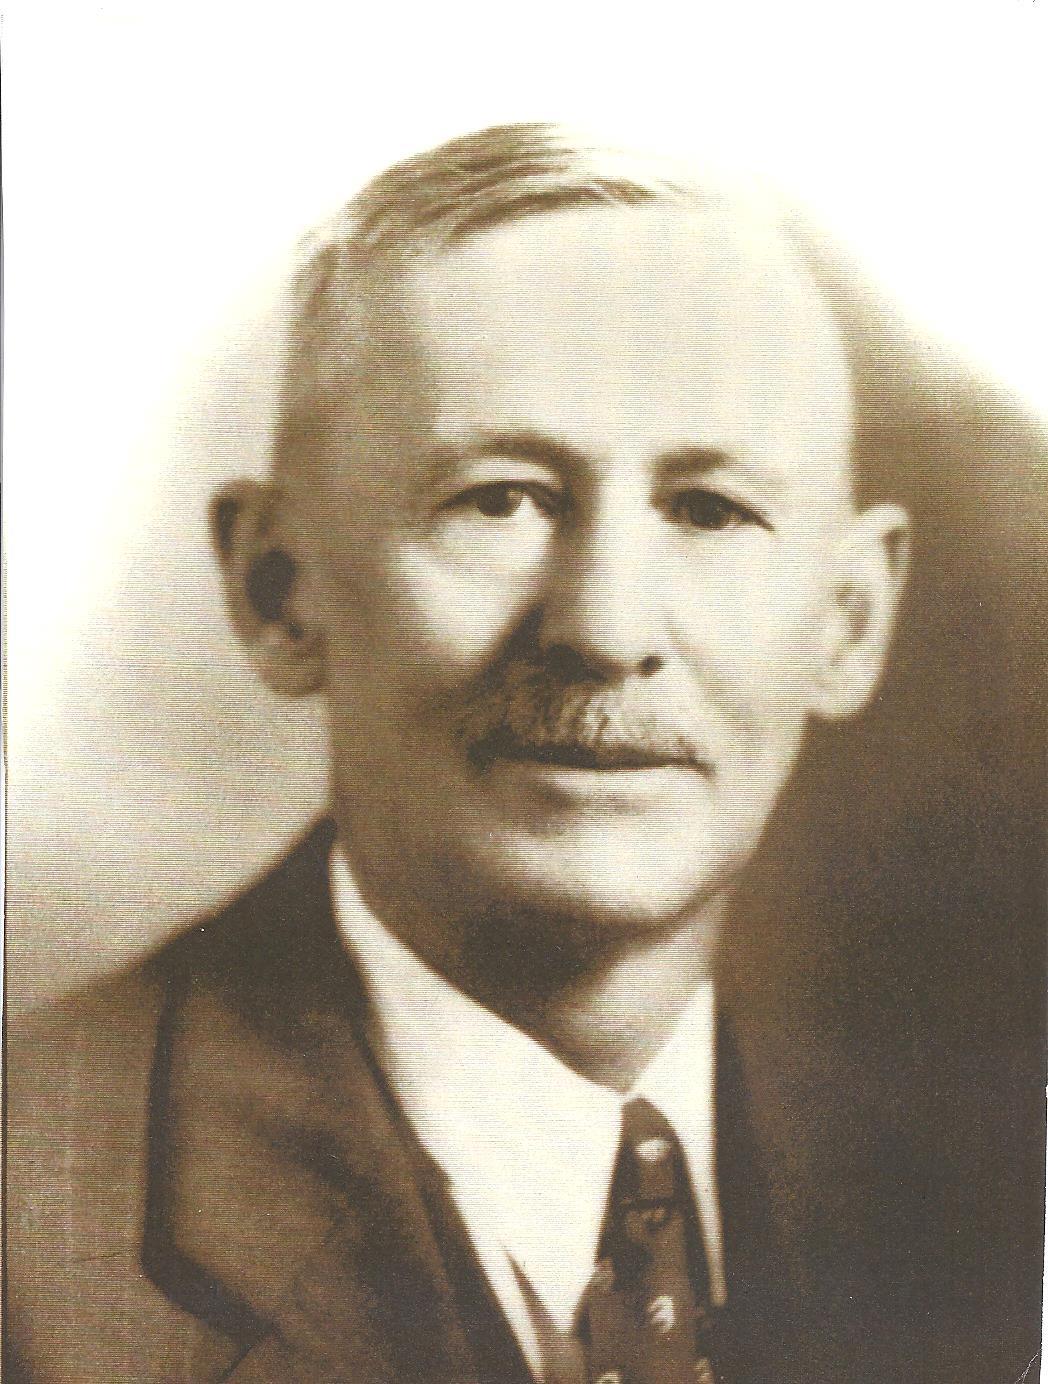 John Jefferson Graham